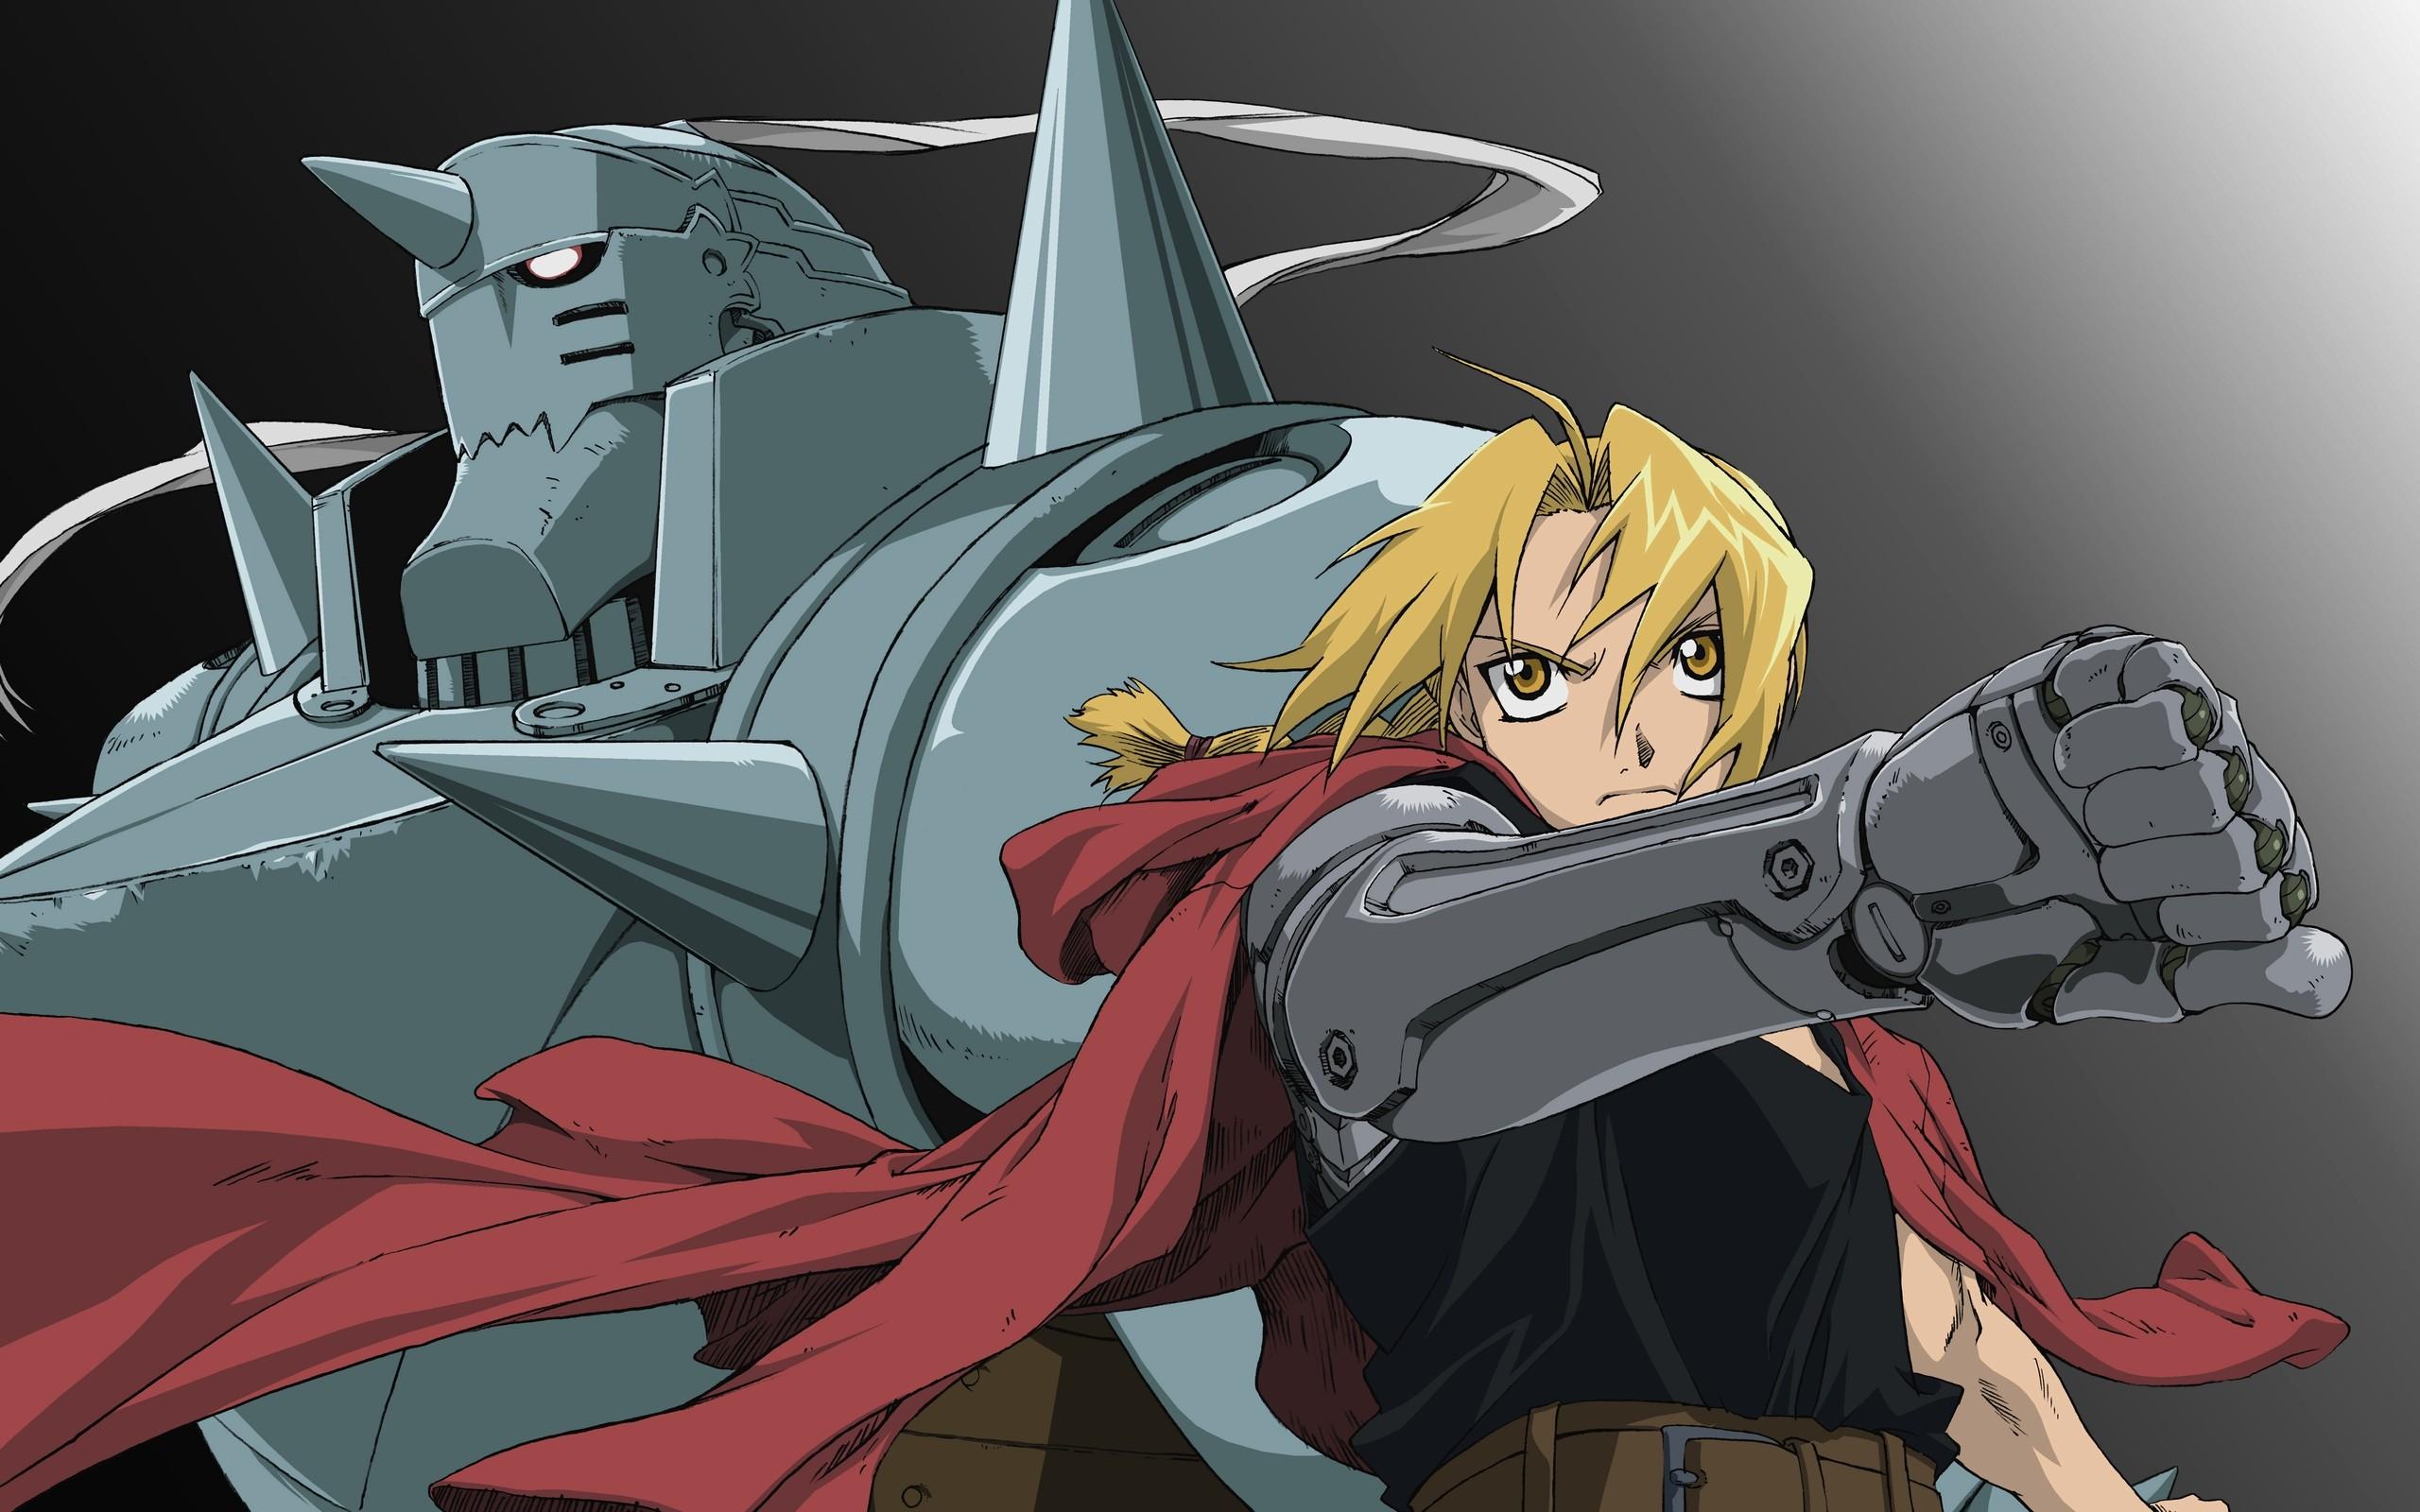 Fullmetal Alchemist blondes Elric Alphonse Elric Edward wallpaper 2560x1600